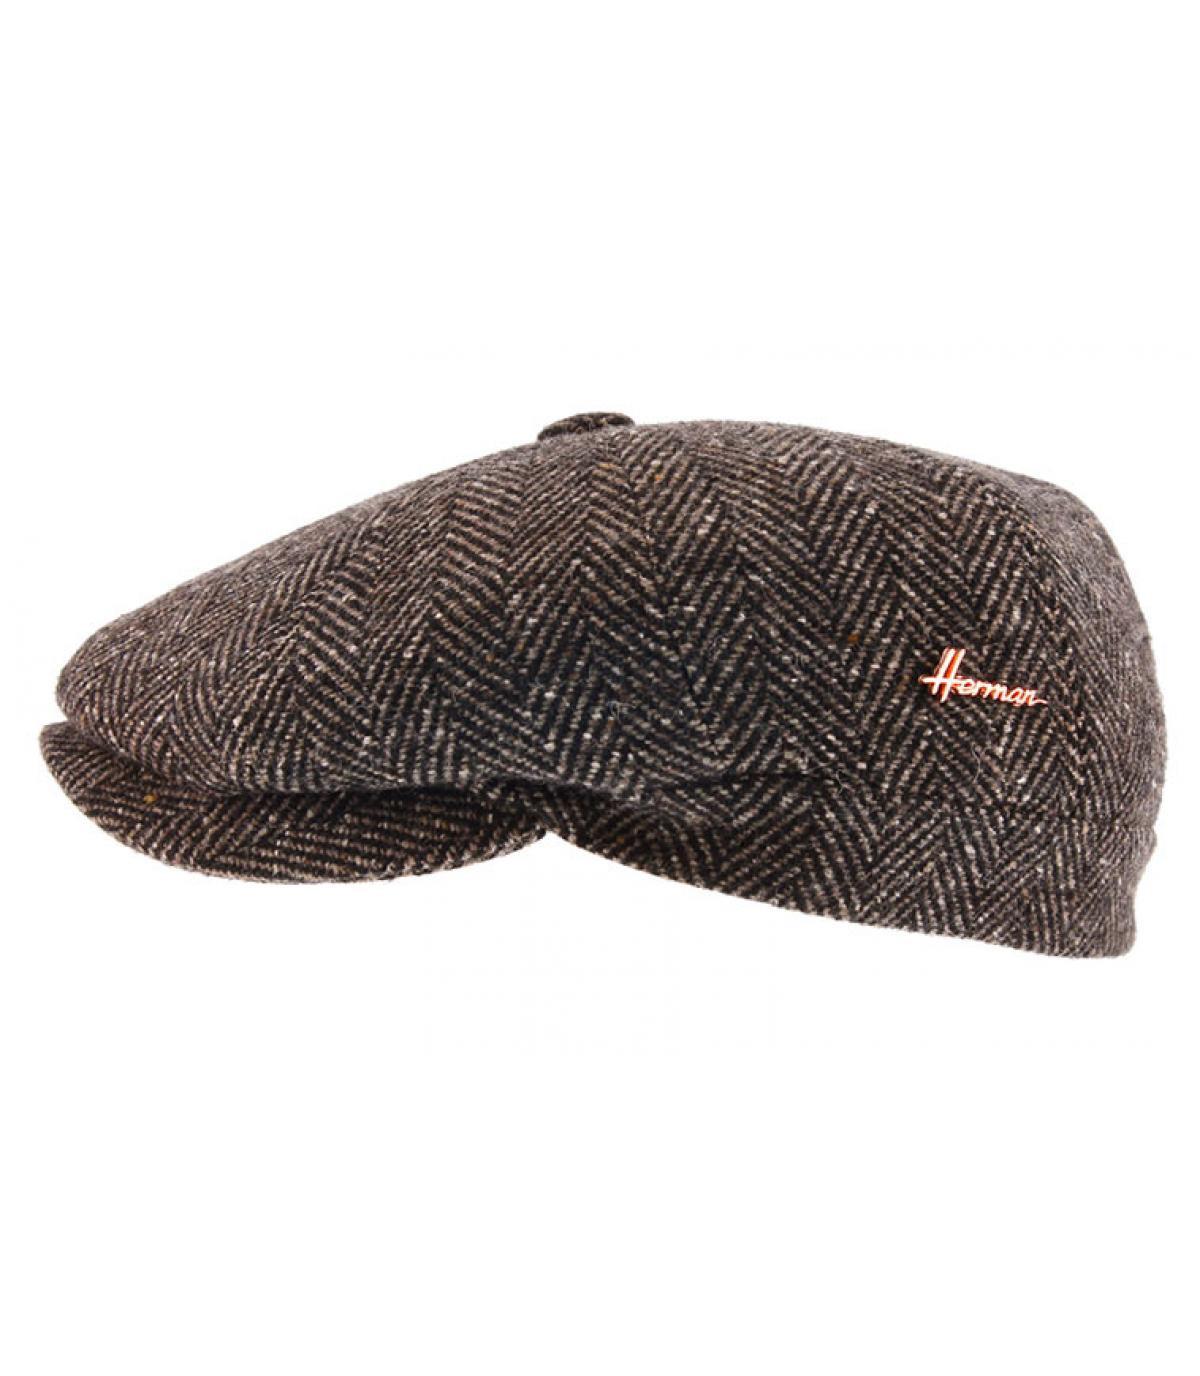 Dettagli Advancer Wool brown - image 2